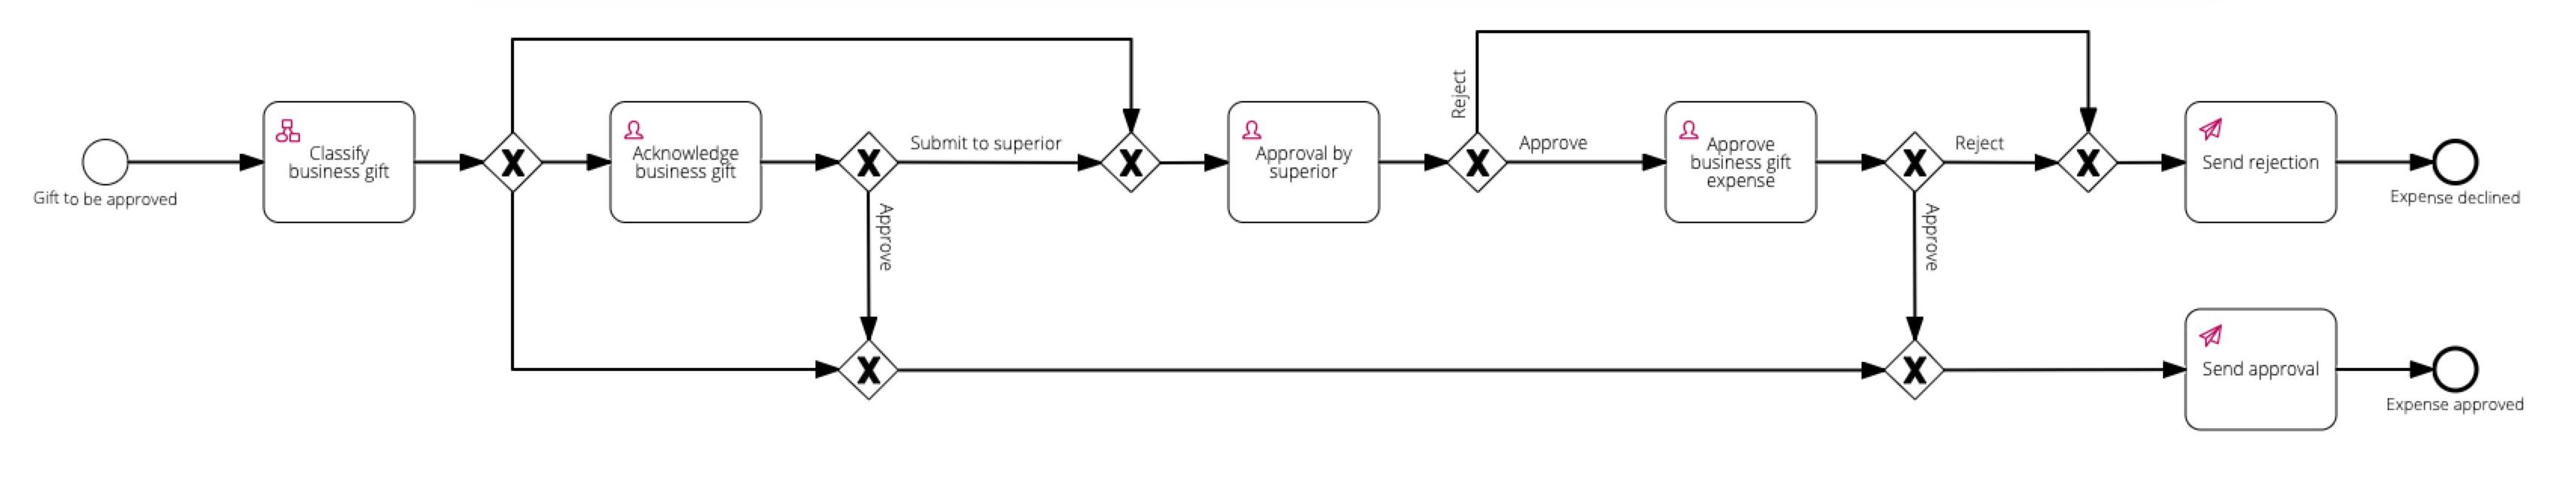 Grant notification process after adjustment screenshot